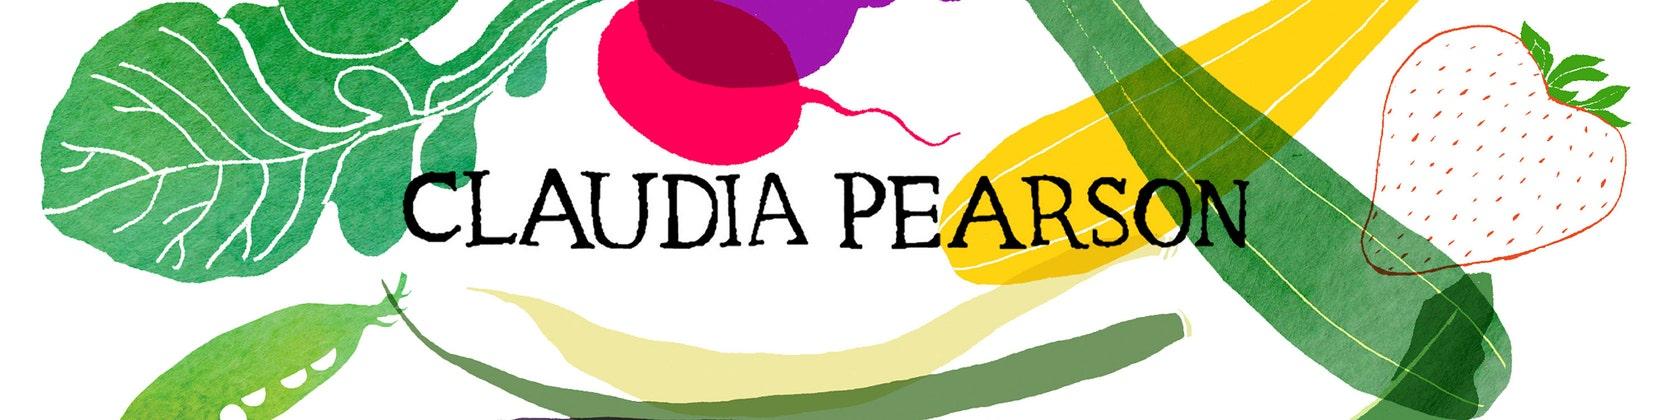 Claudia Pearson von claudiagpearson auf Etsy